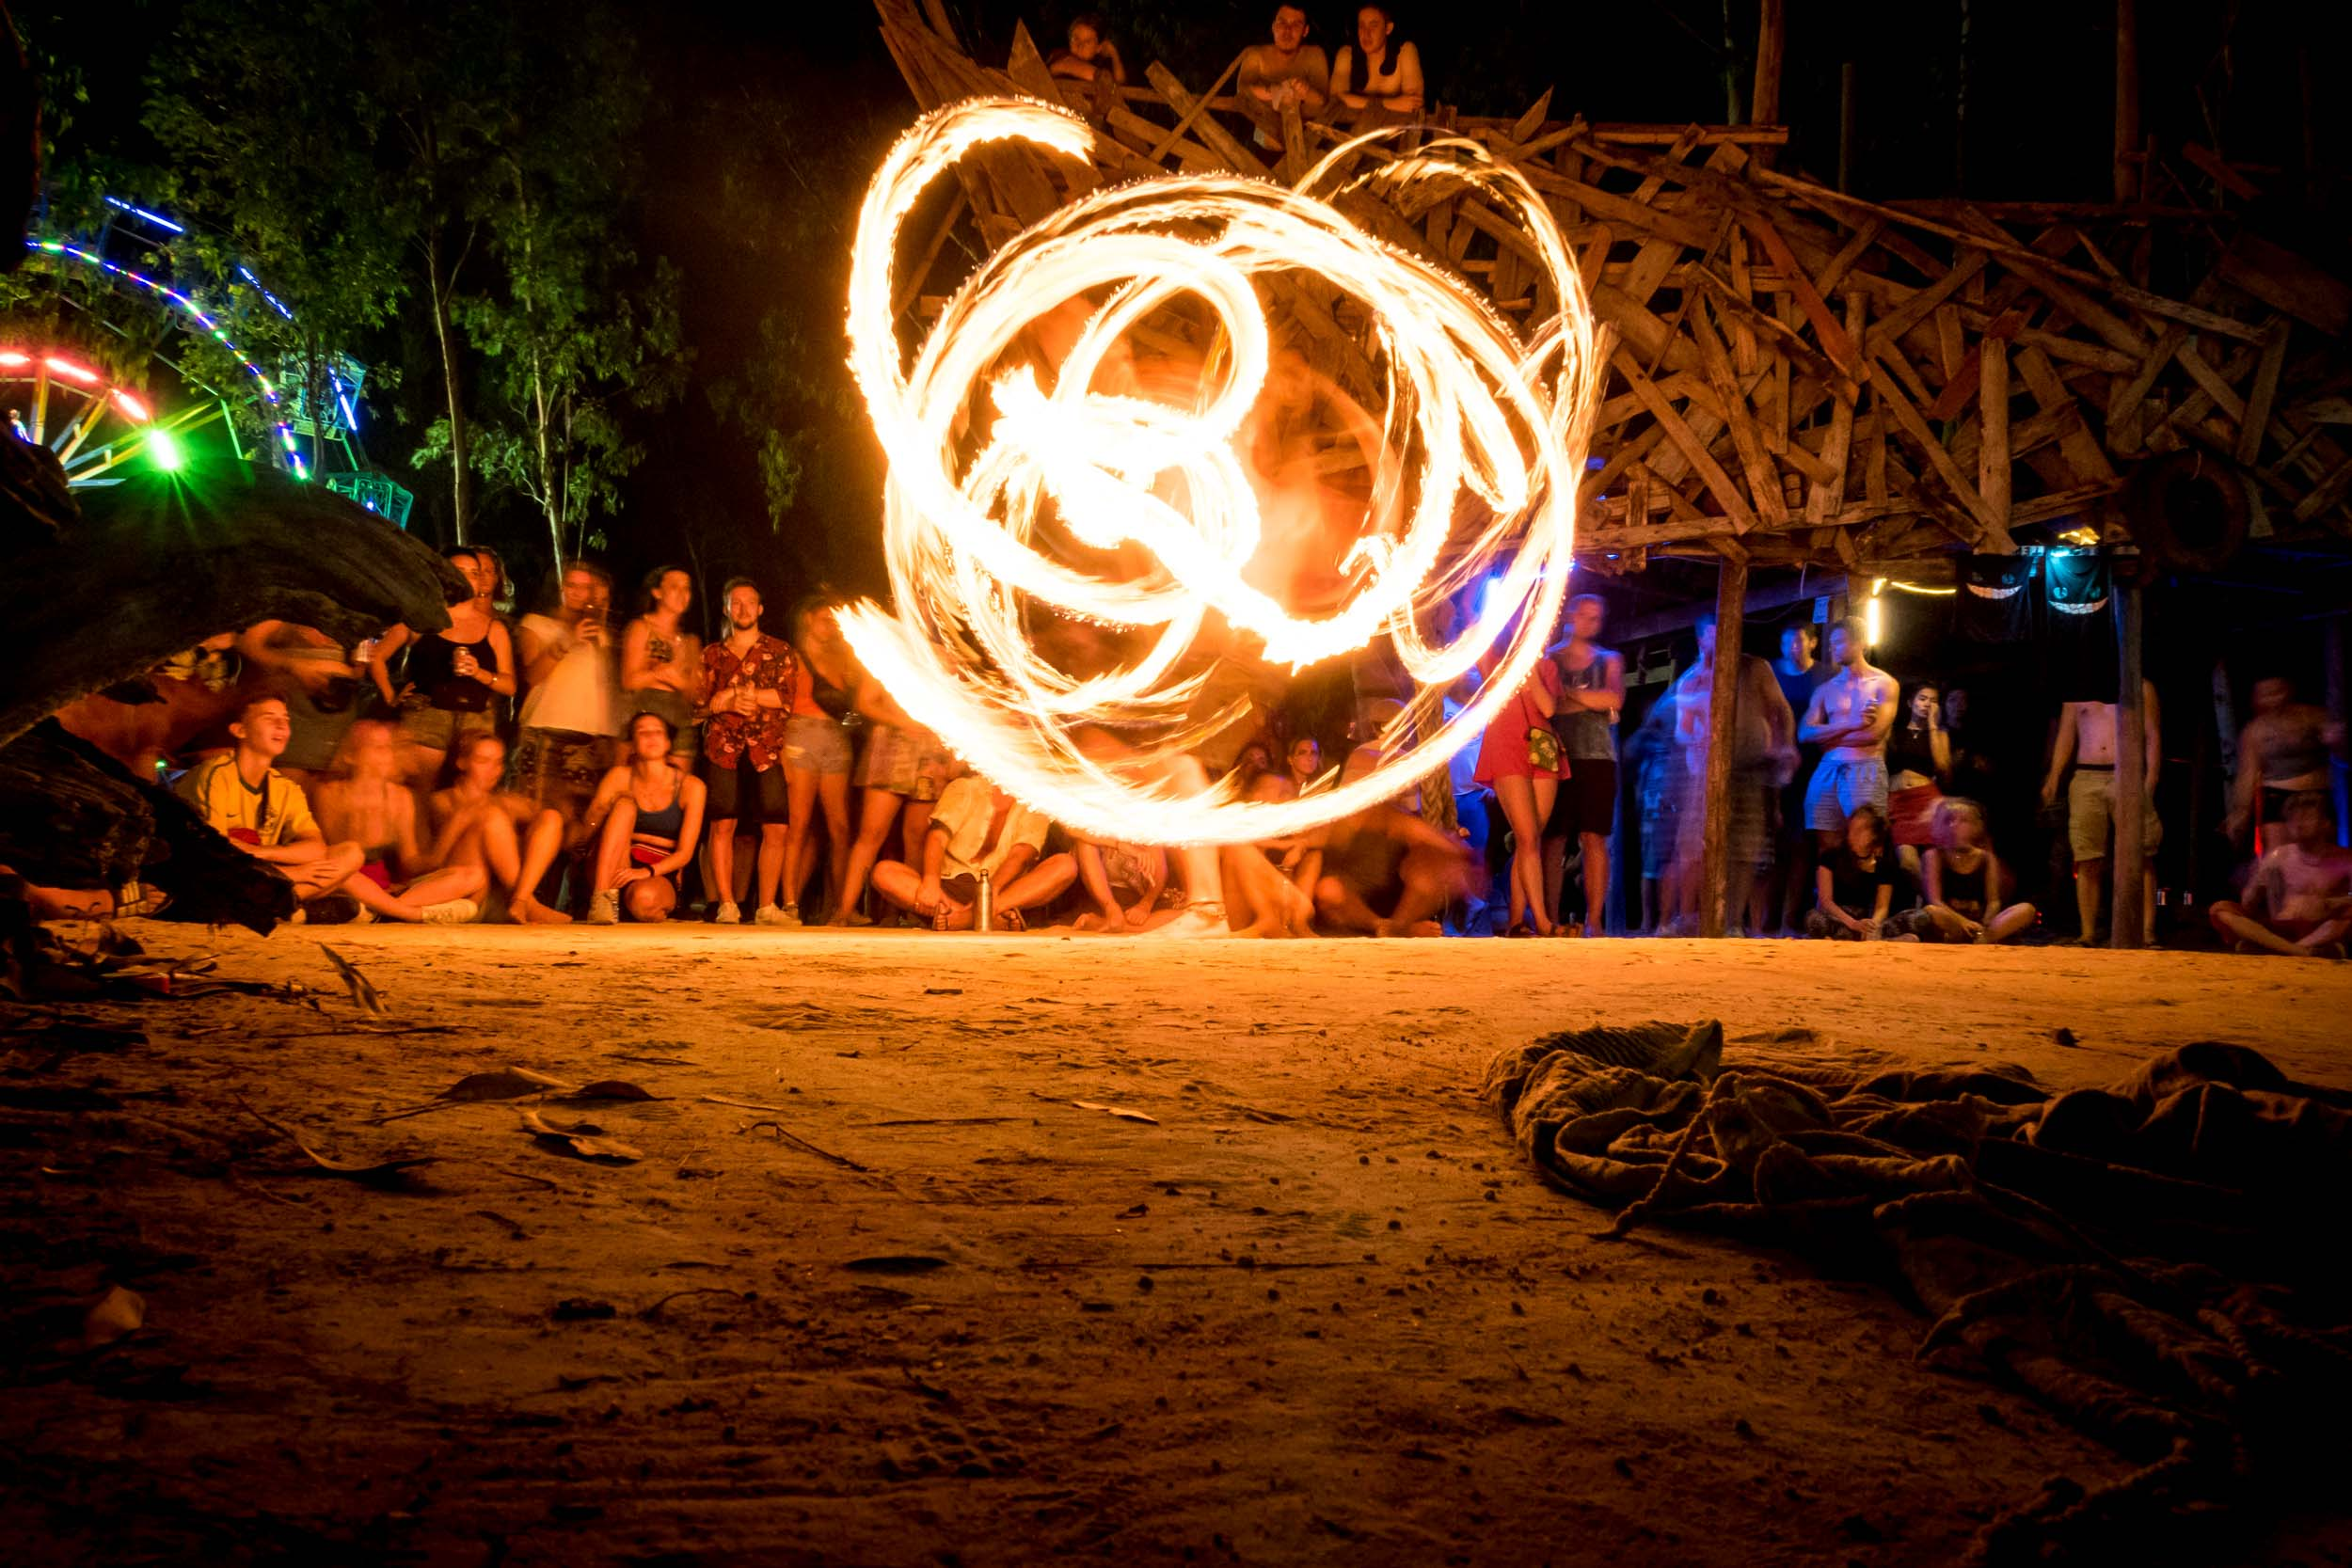 Fire Dance at Kerfuffle, Otres Village, Sihanoukville, Cambodia.